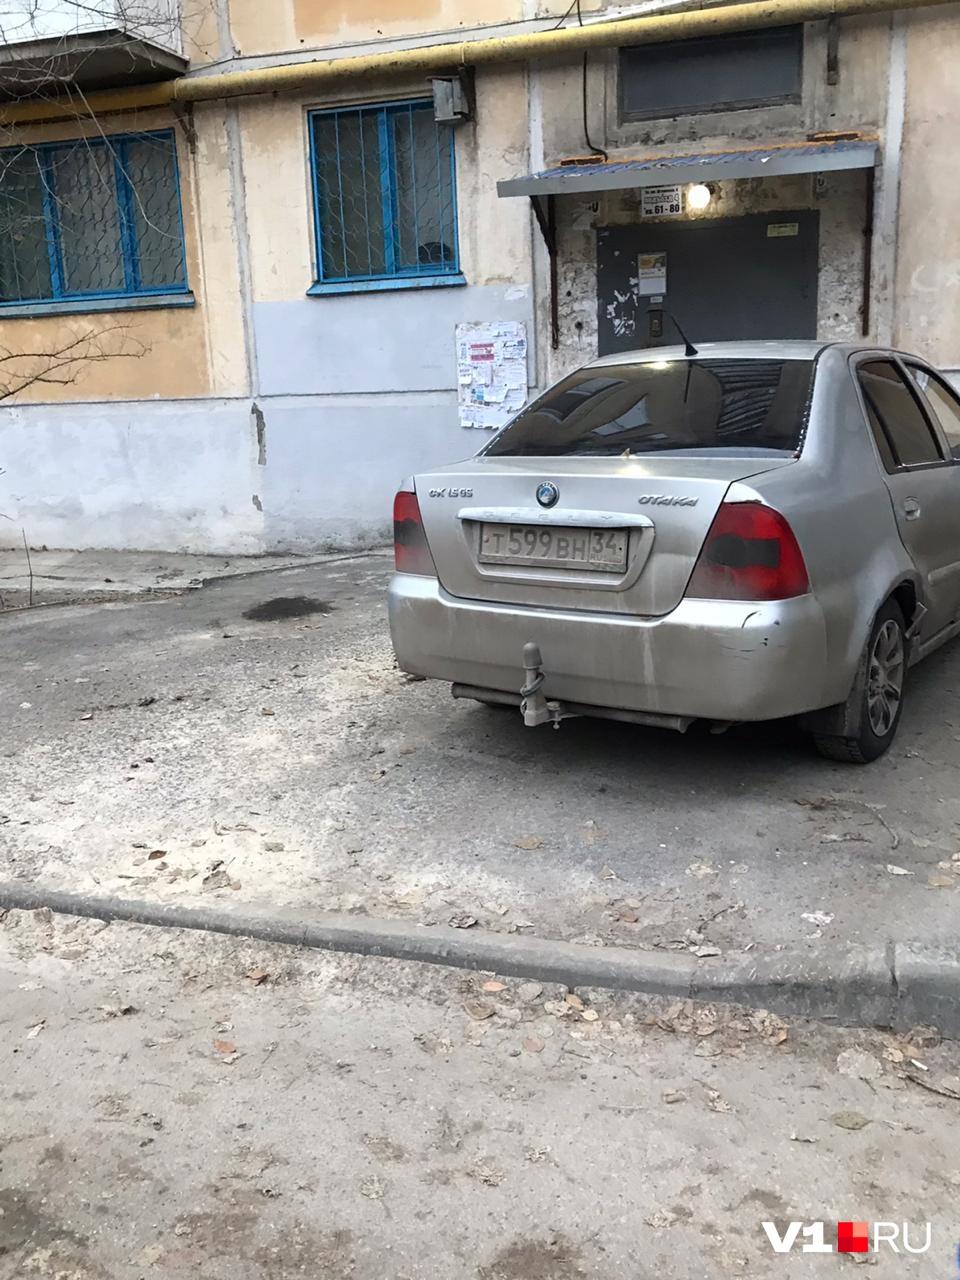 Дорожку явно ремонтировали не для автомобилей